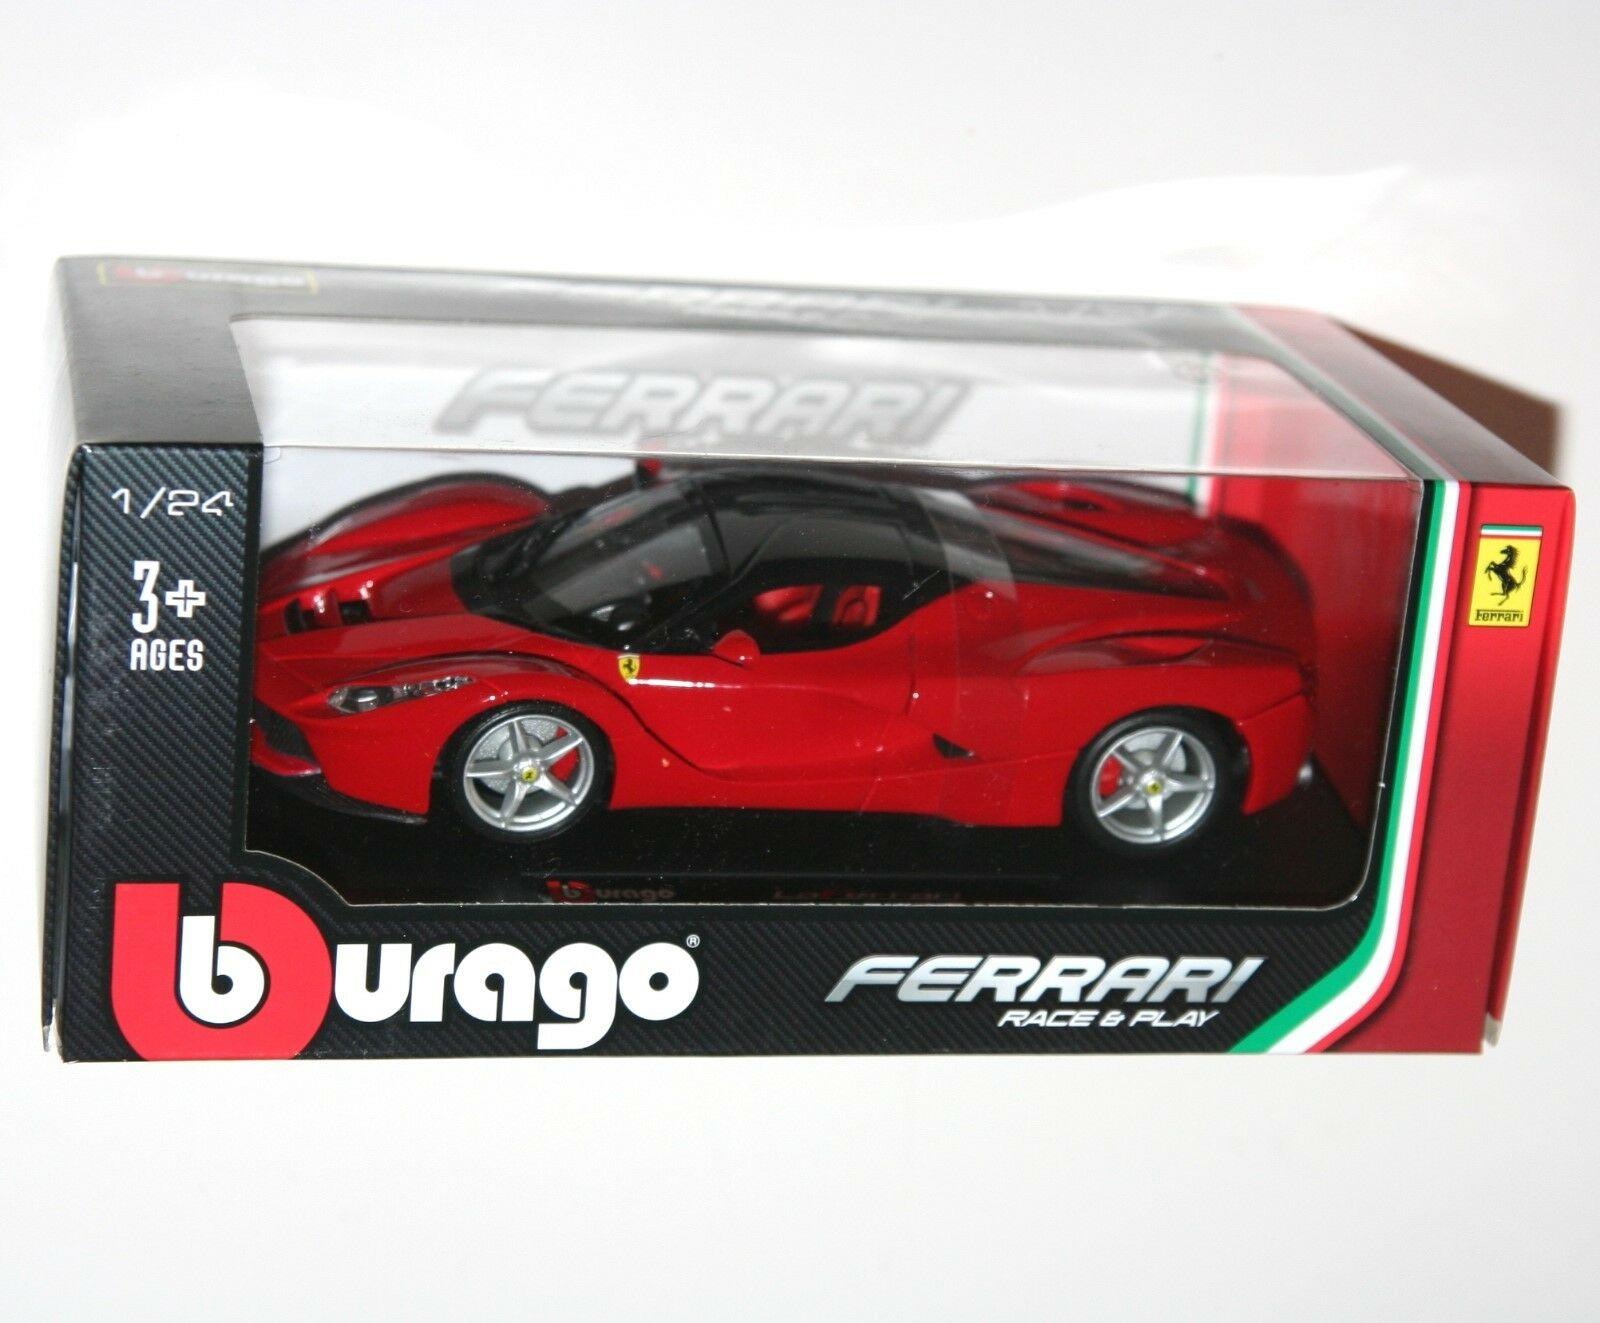 Burago - FERRARI LAFERRARI (Red) - Die Cast Model - Scale 1 24